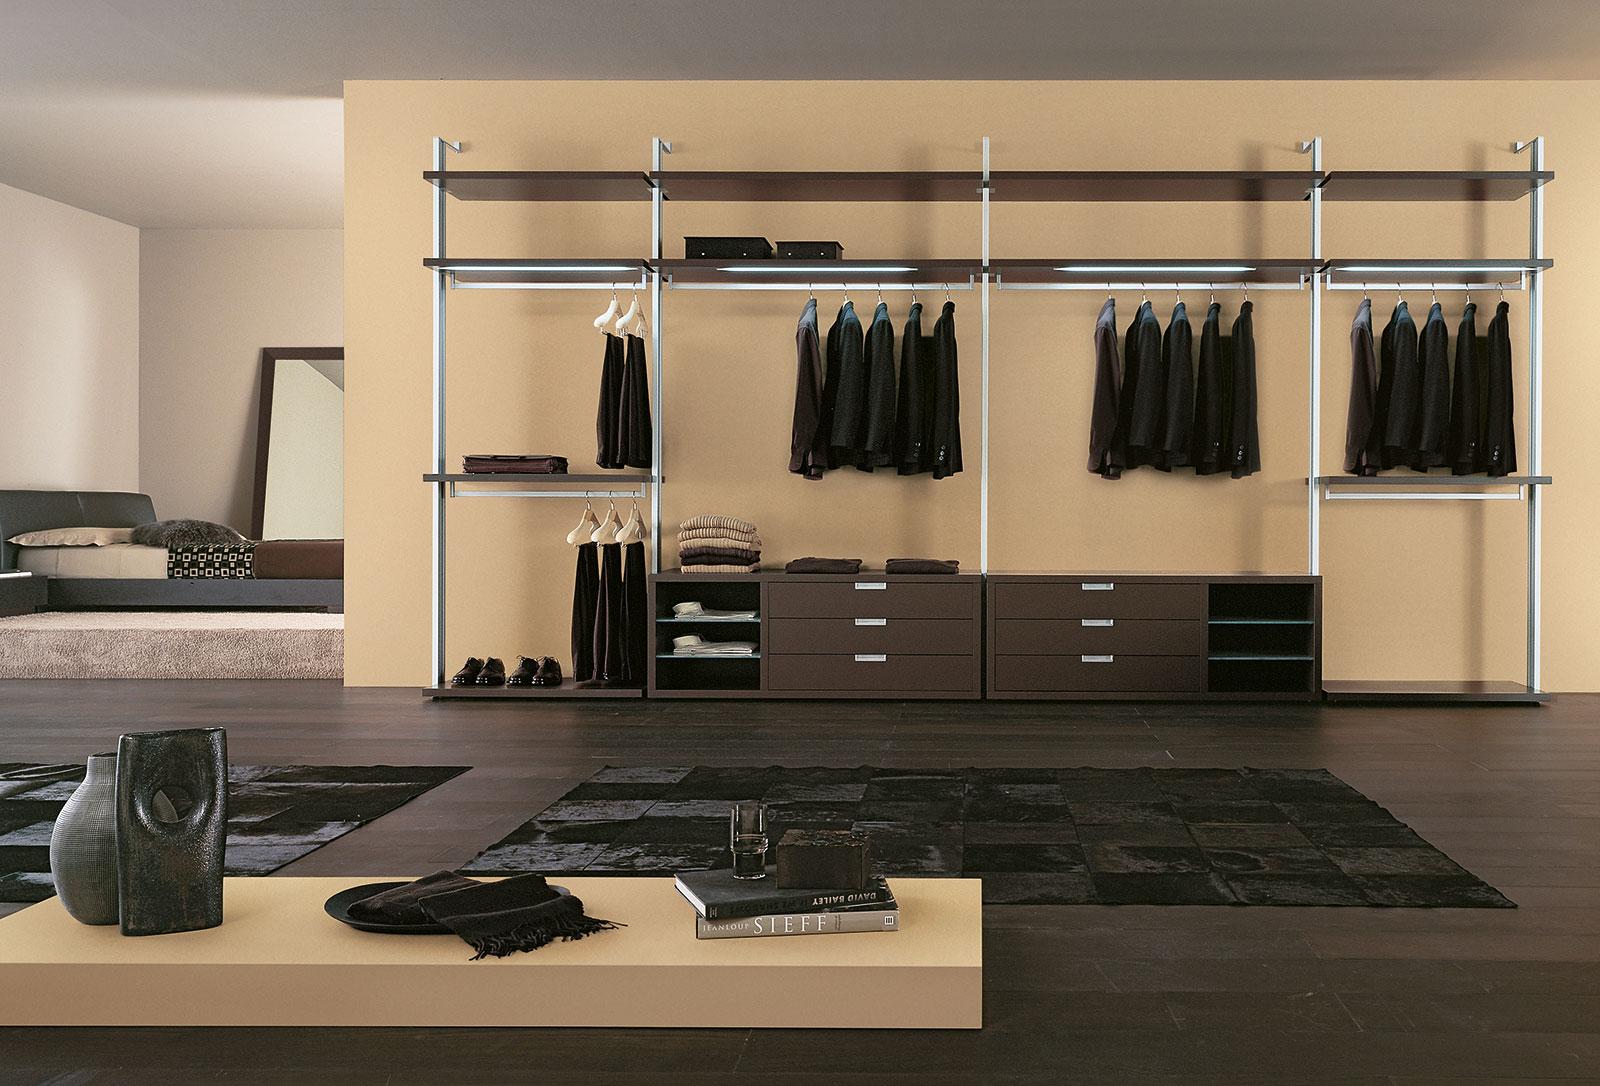 Cabina Armadio Bassa : Cabina armadio su misura porte & sistemi henry glass